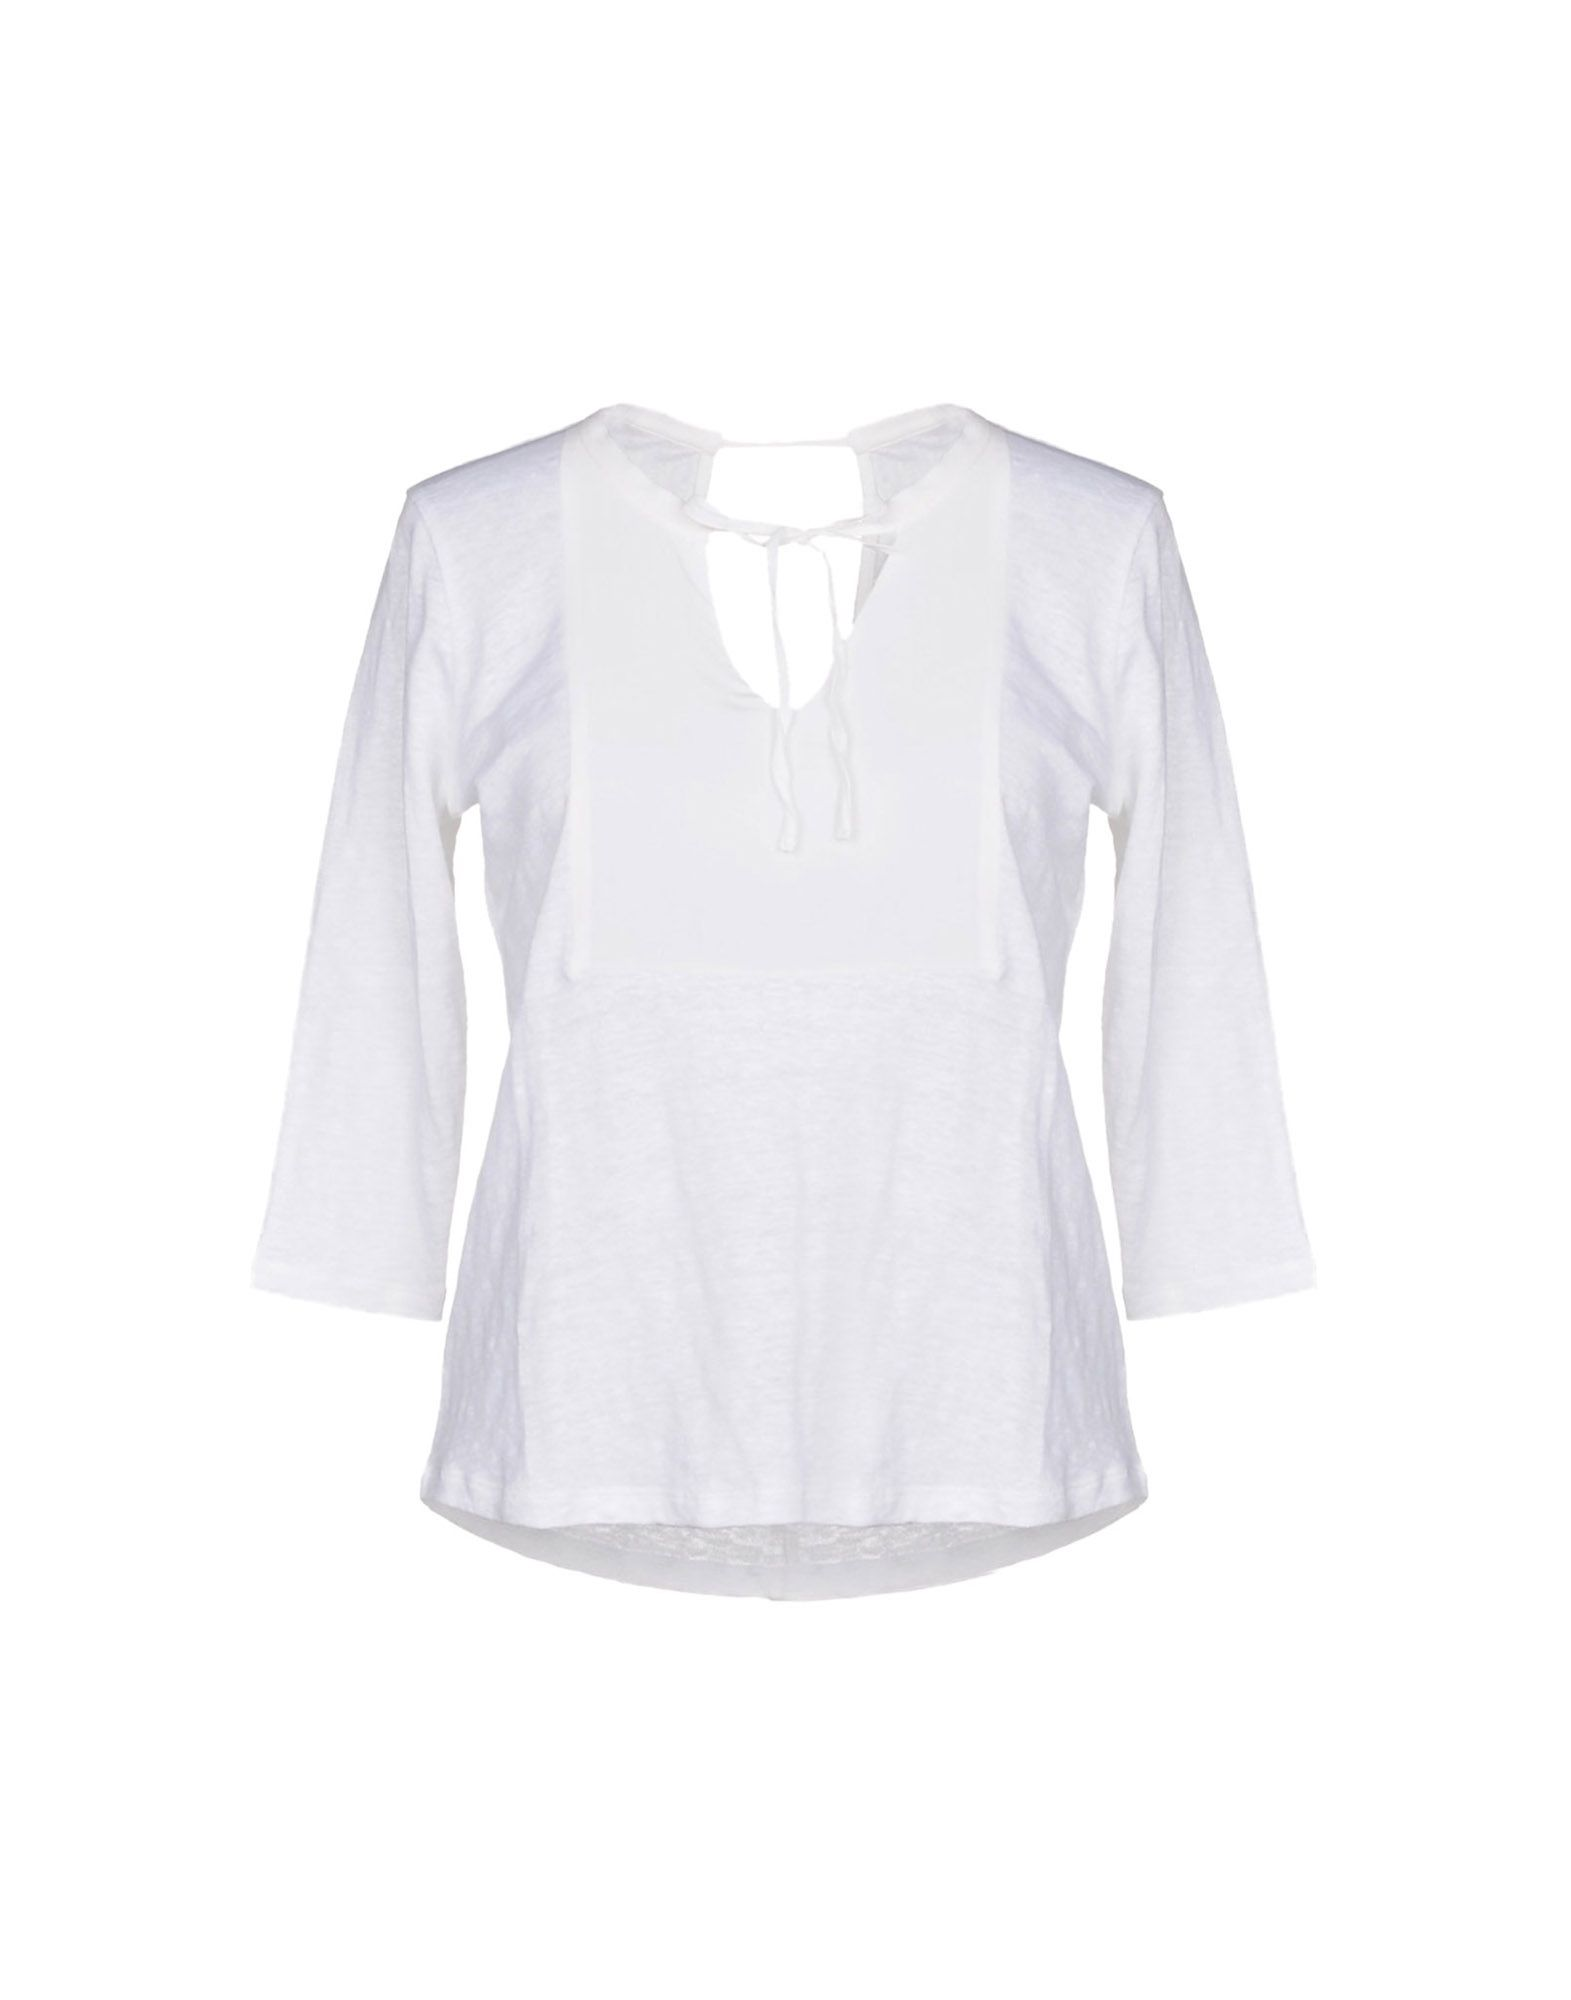 SANDRO PARIS T-Shirt in White